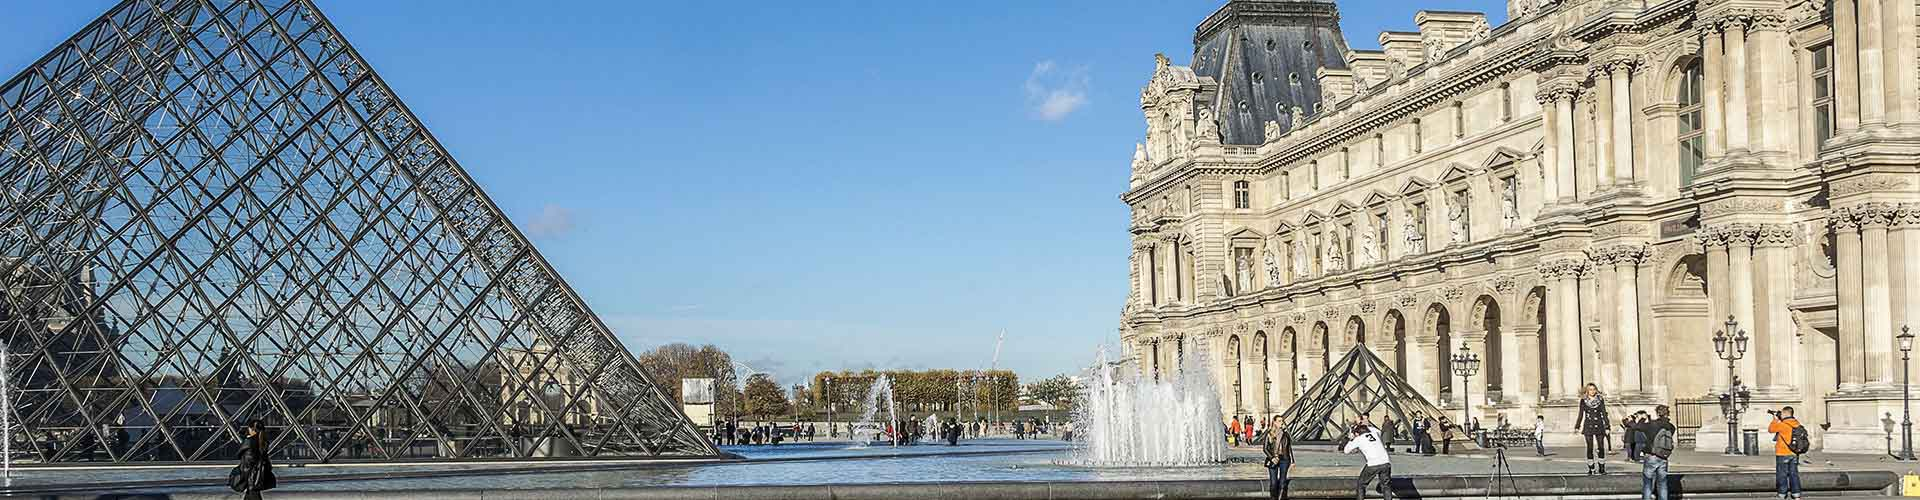 París - Hoteles baratos cerca a Louvre. Mapas de París, Fotos y comentarios de cada Hotel en París.